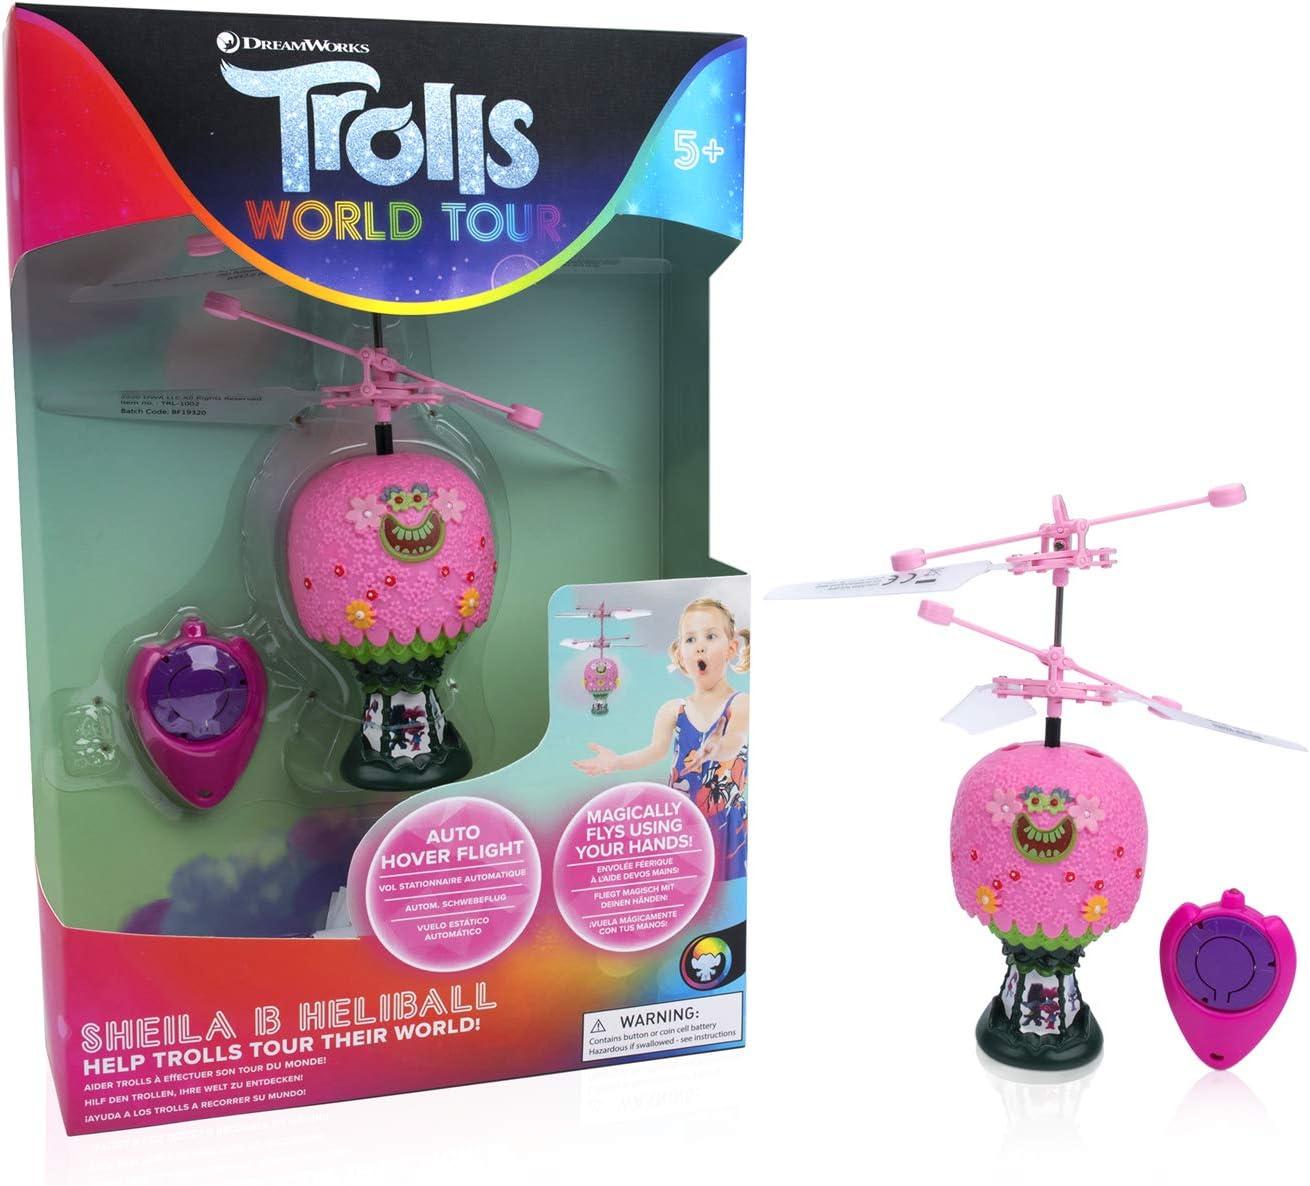 WOW! STUFF Trolls World Tour Princess Poppy Hot Air Balloon Shelia B Remote Controlled Mini Flying Ball 64% OFF £8.38 @ Amazon